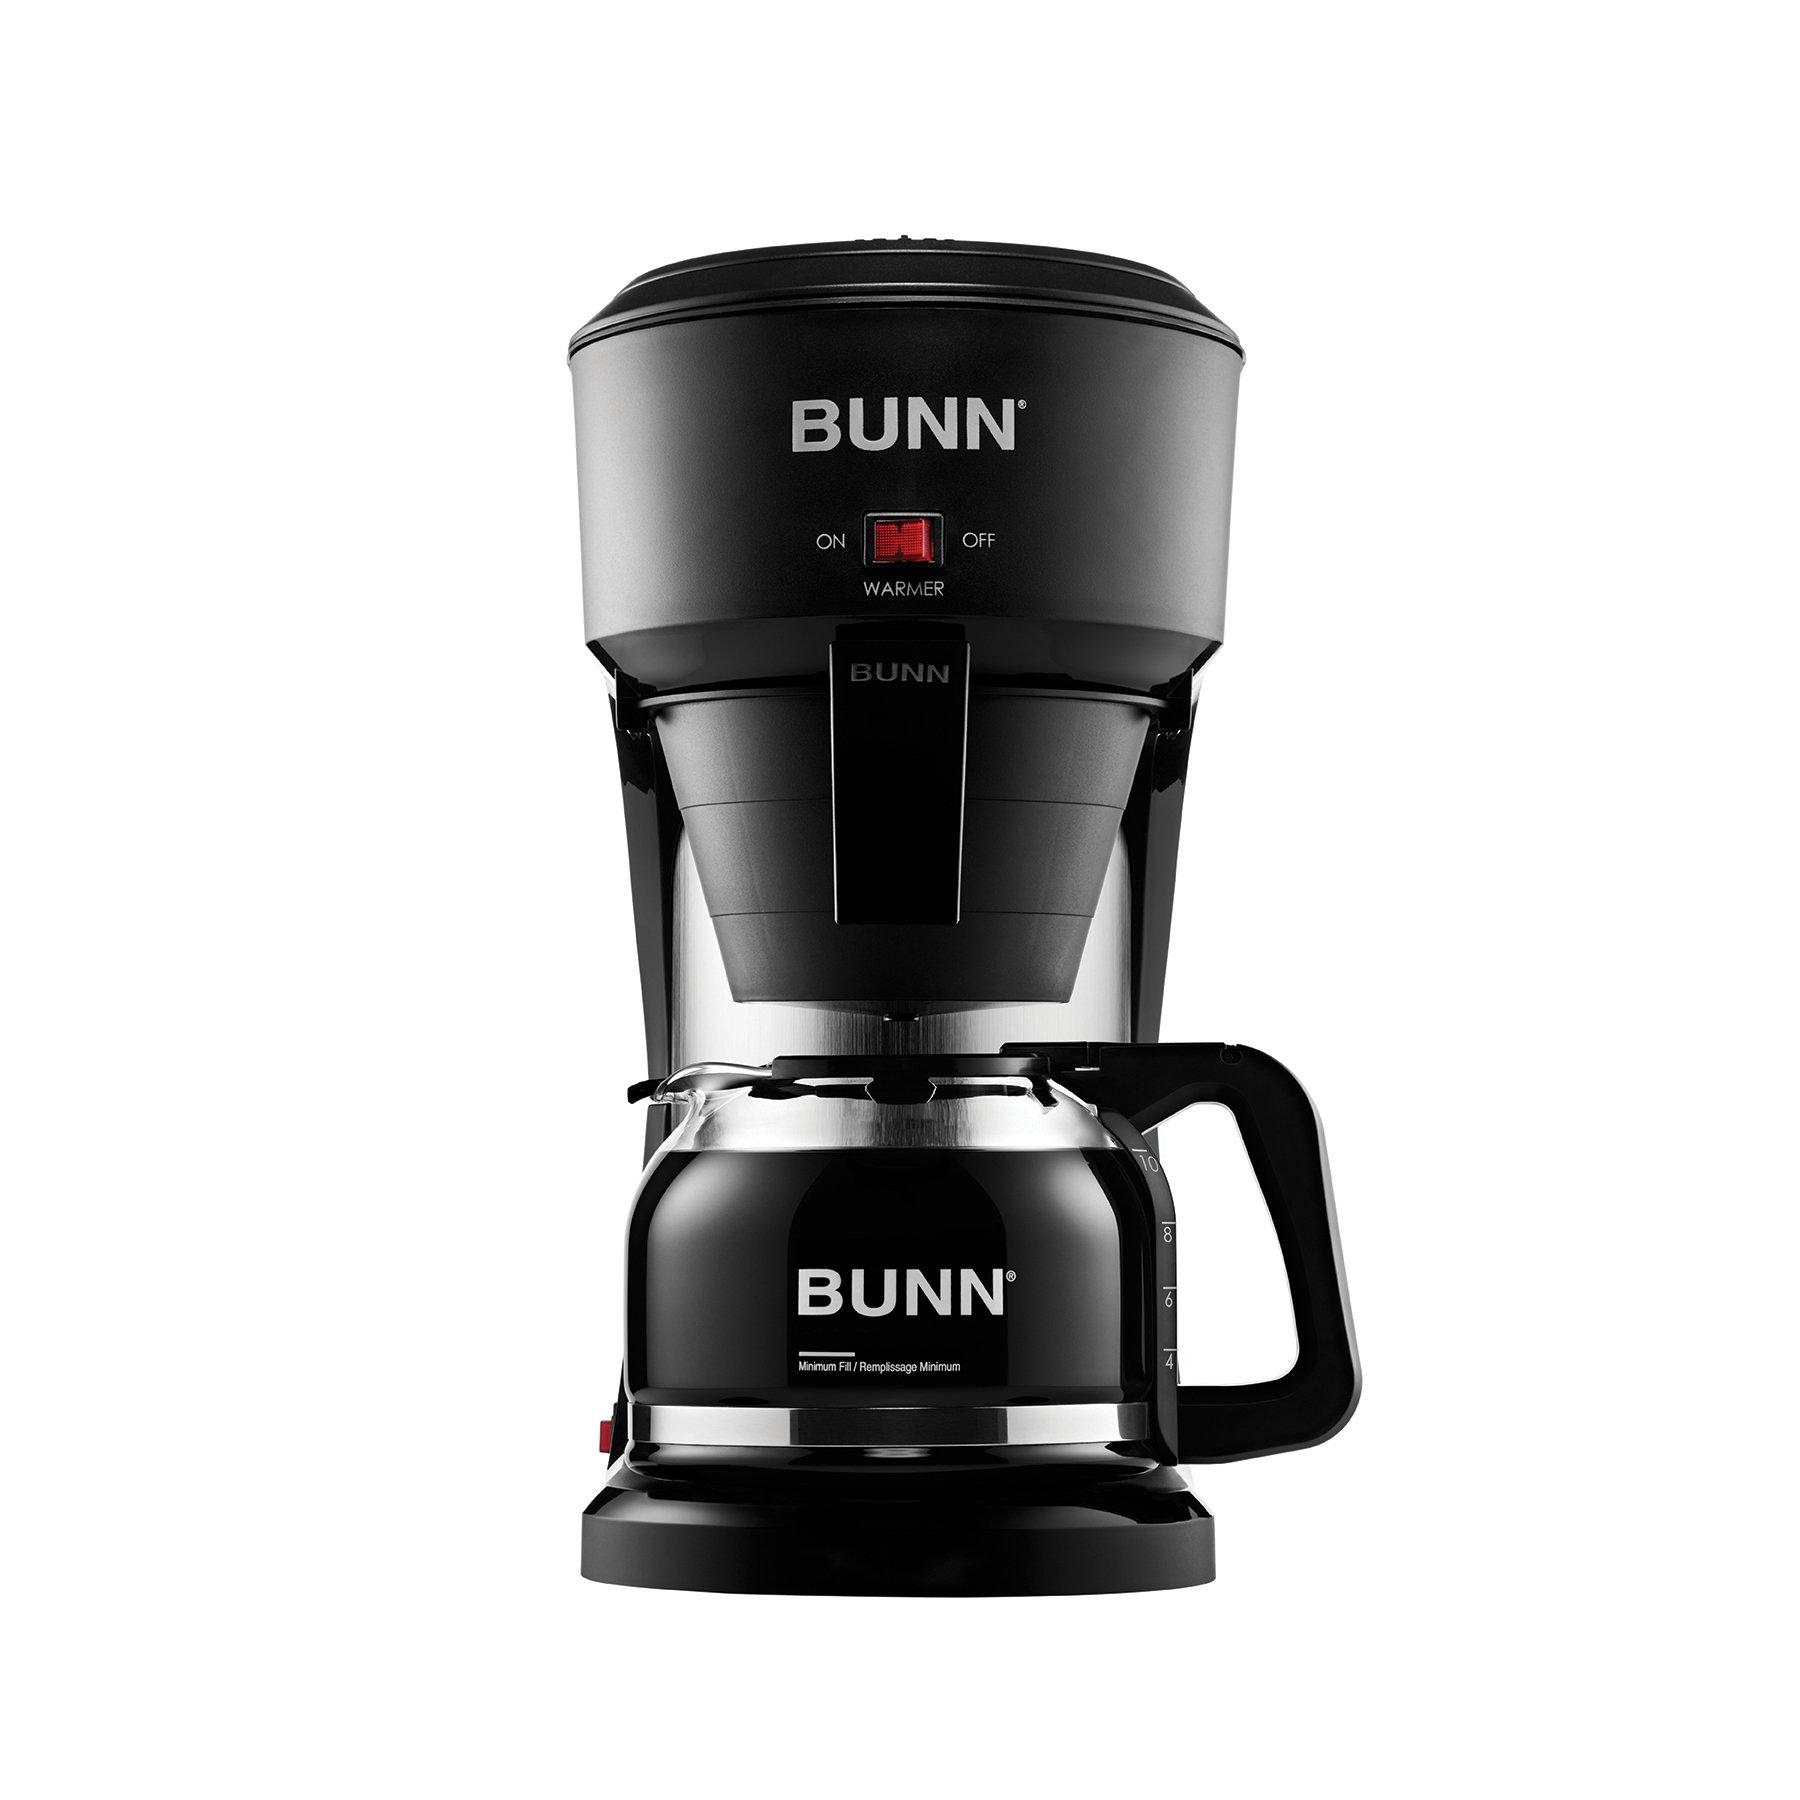 BUNN Speed Brew 10-Cup Home Coffee Brewer by BUNN